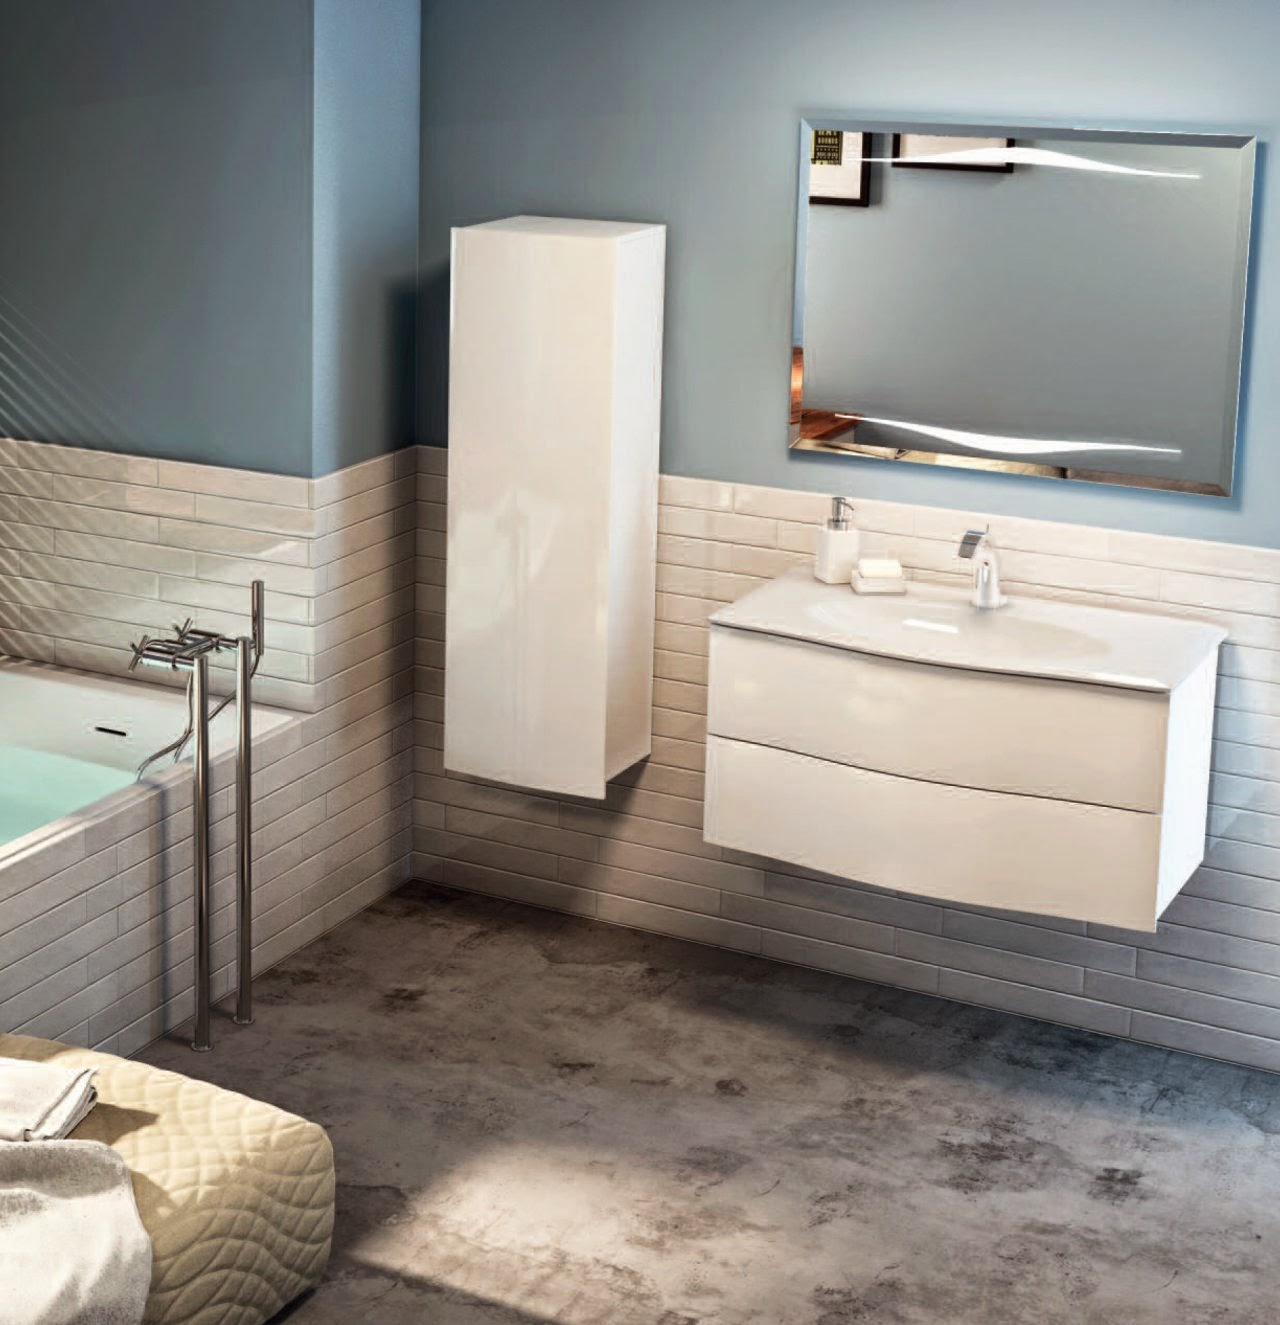 Aqualys burdin bossert prolians besancon collection for Poignee meuble salle de bain